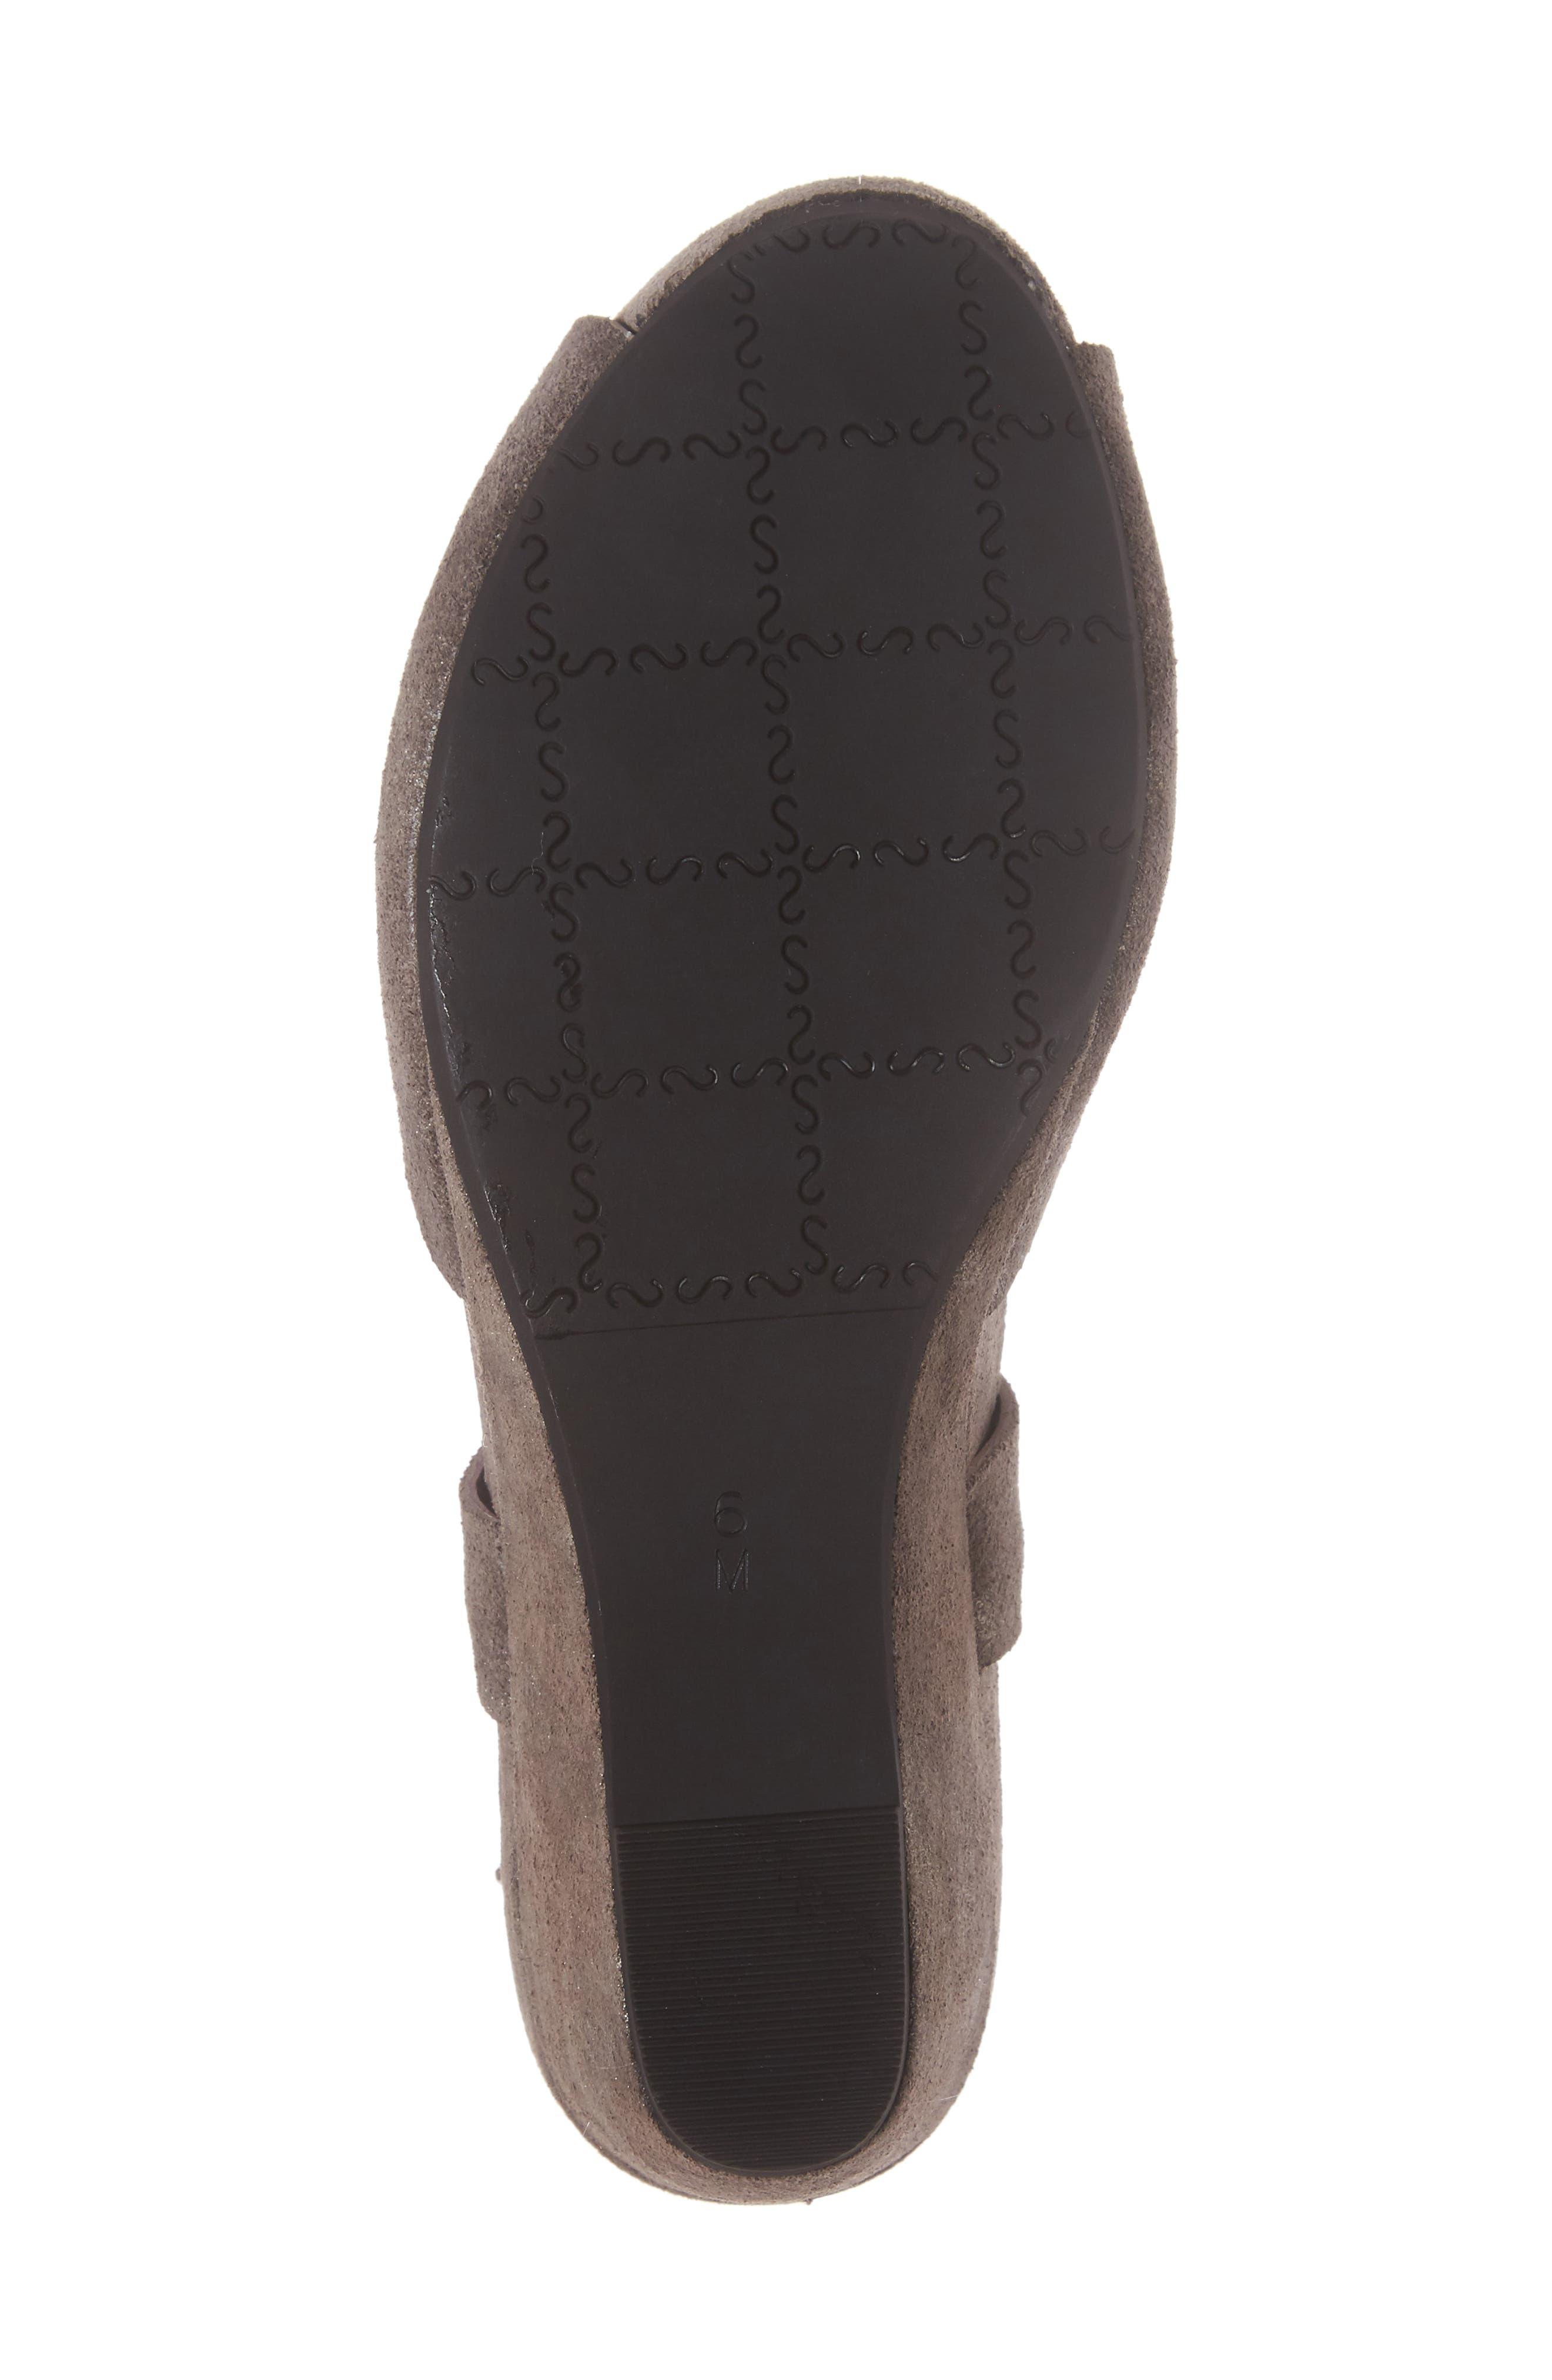 Ilex Wedge Sandal,                             Alternate thumbnail 6, color,                             251